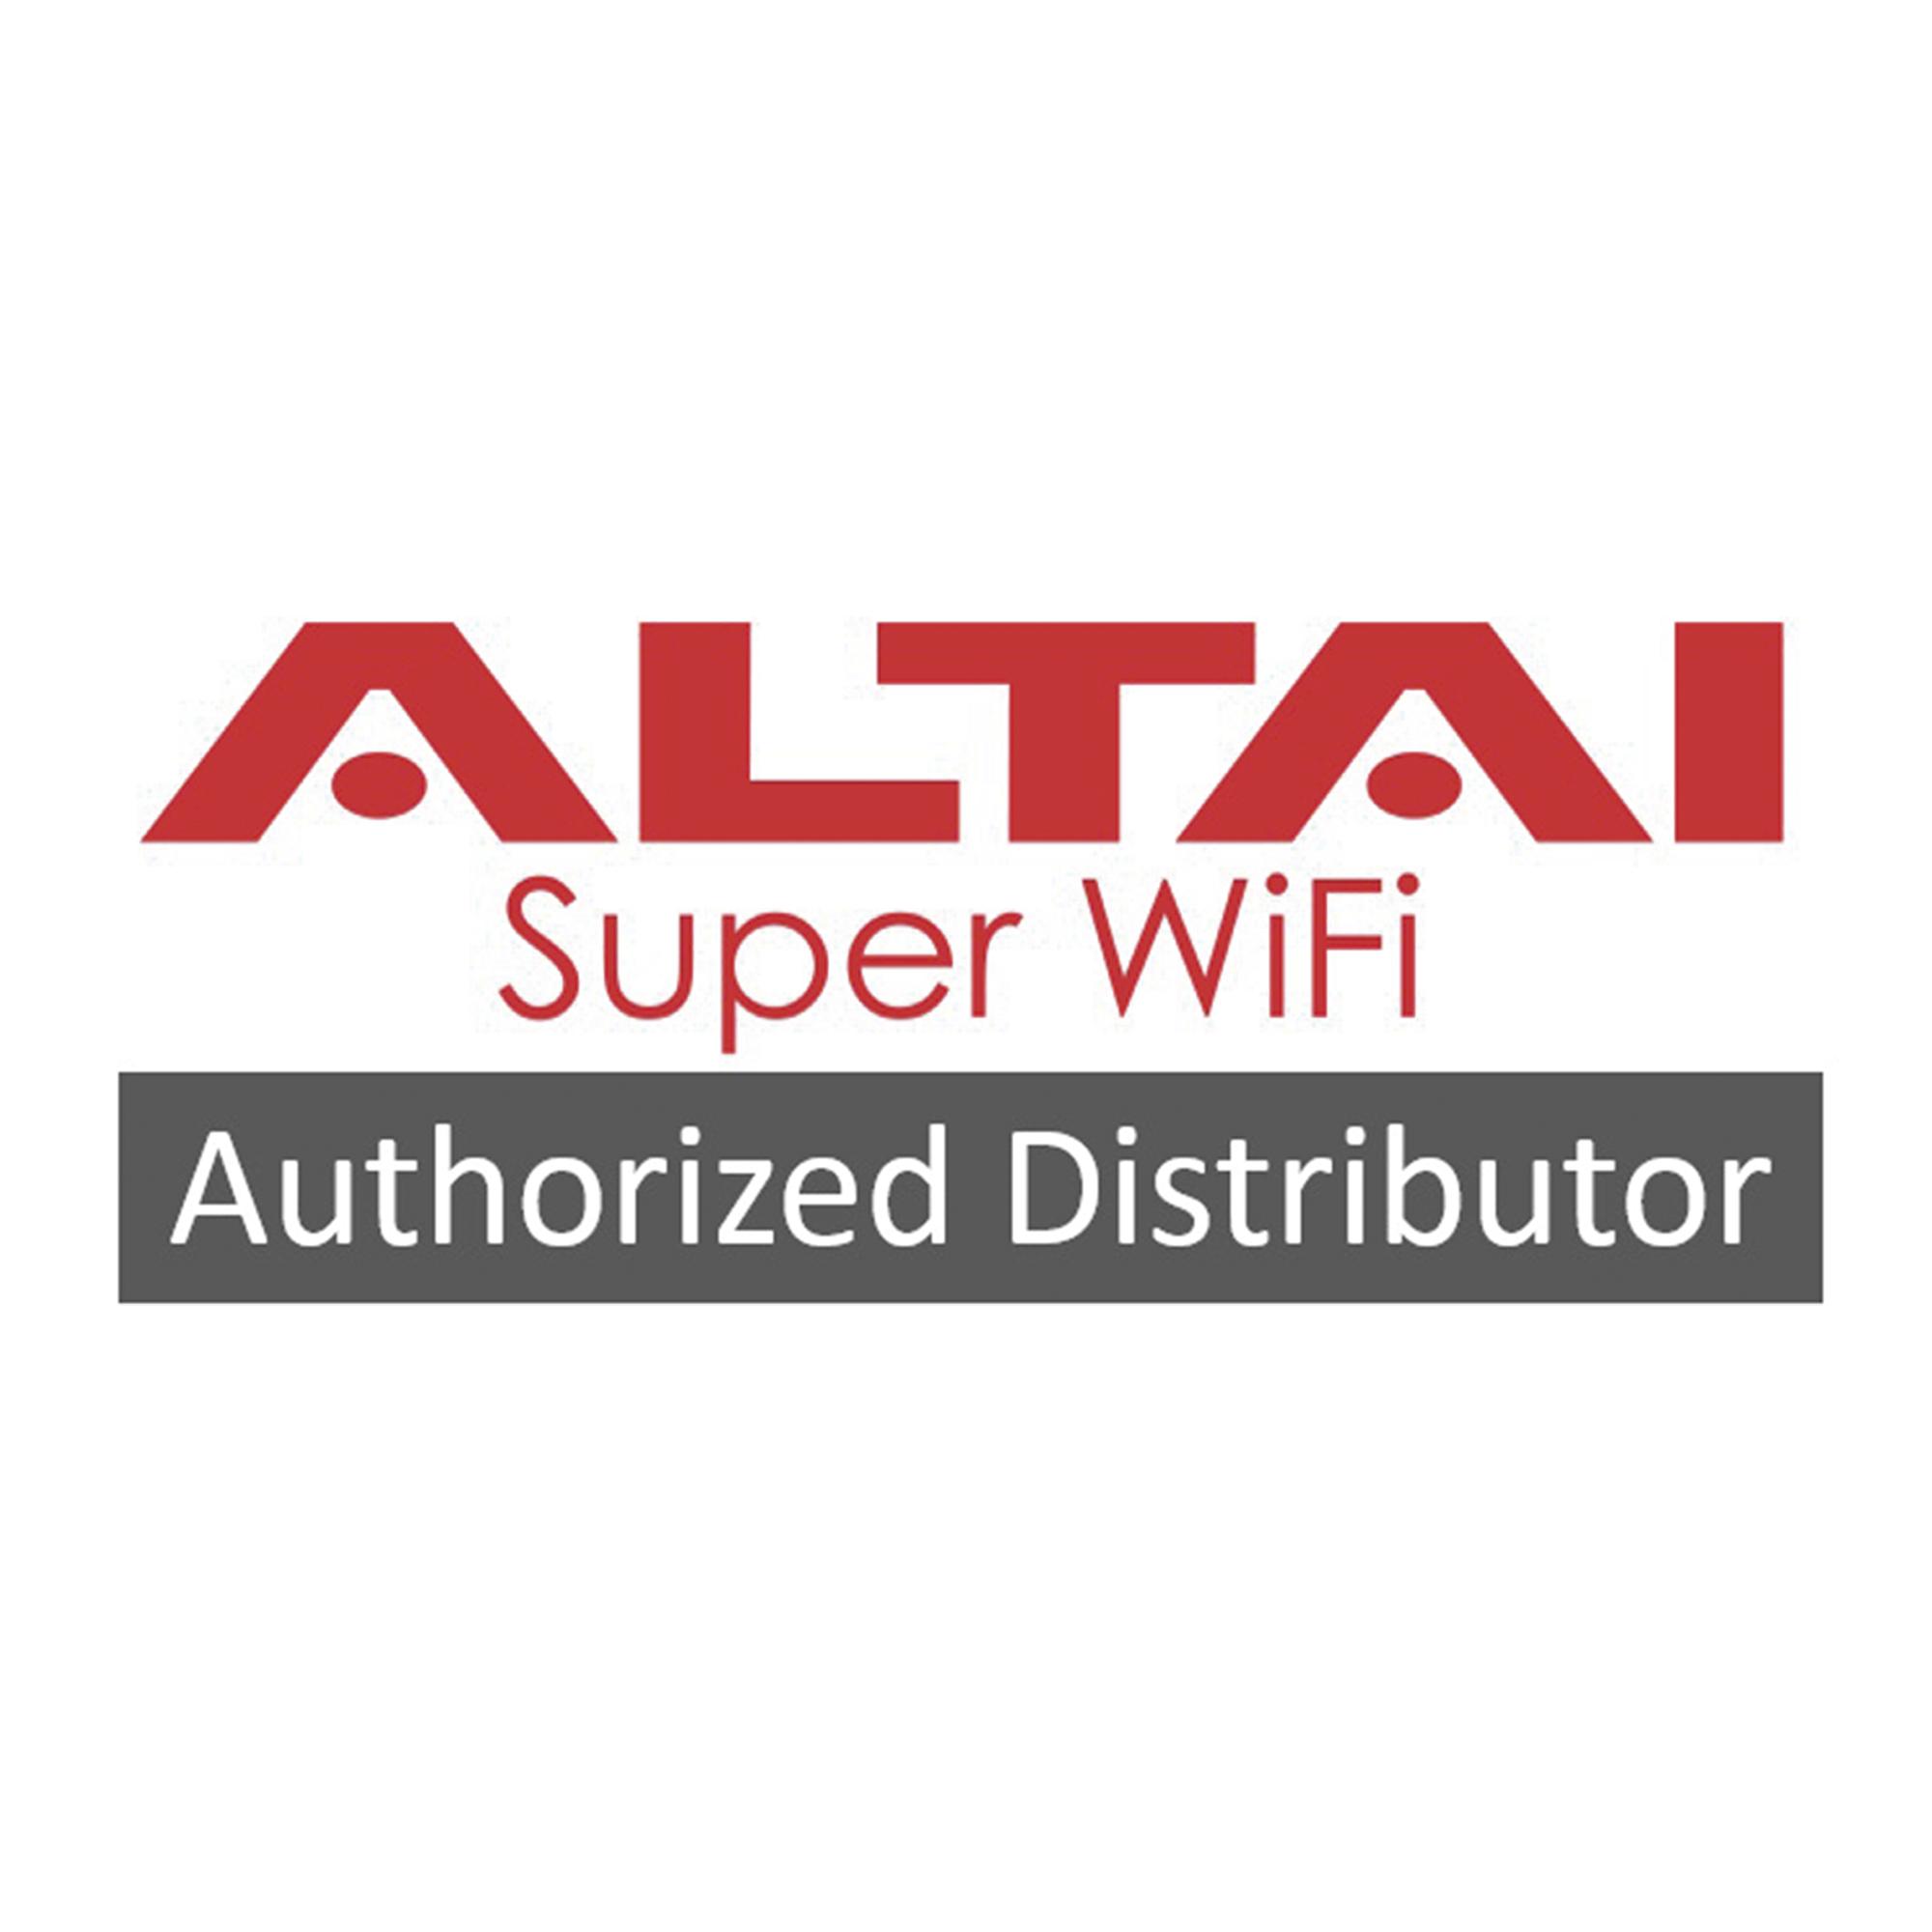 Licencia para gestión de 10 puntos de acceso Super WiFi en controladora AltaiGate 200